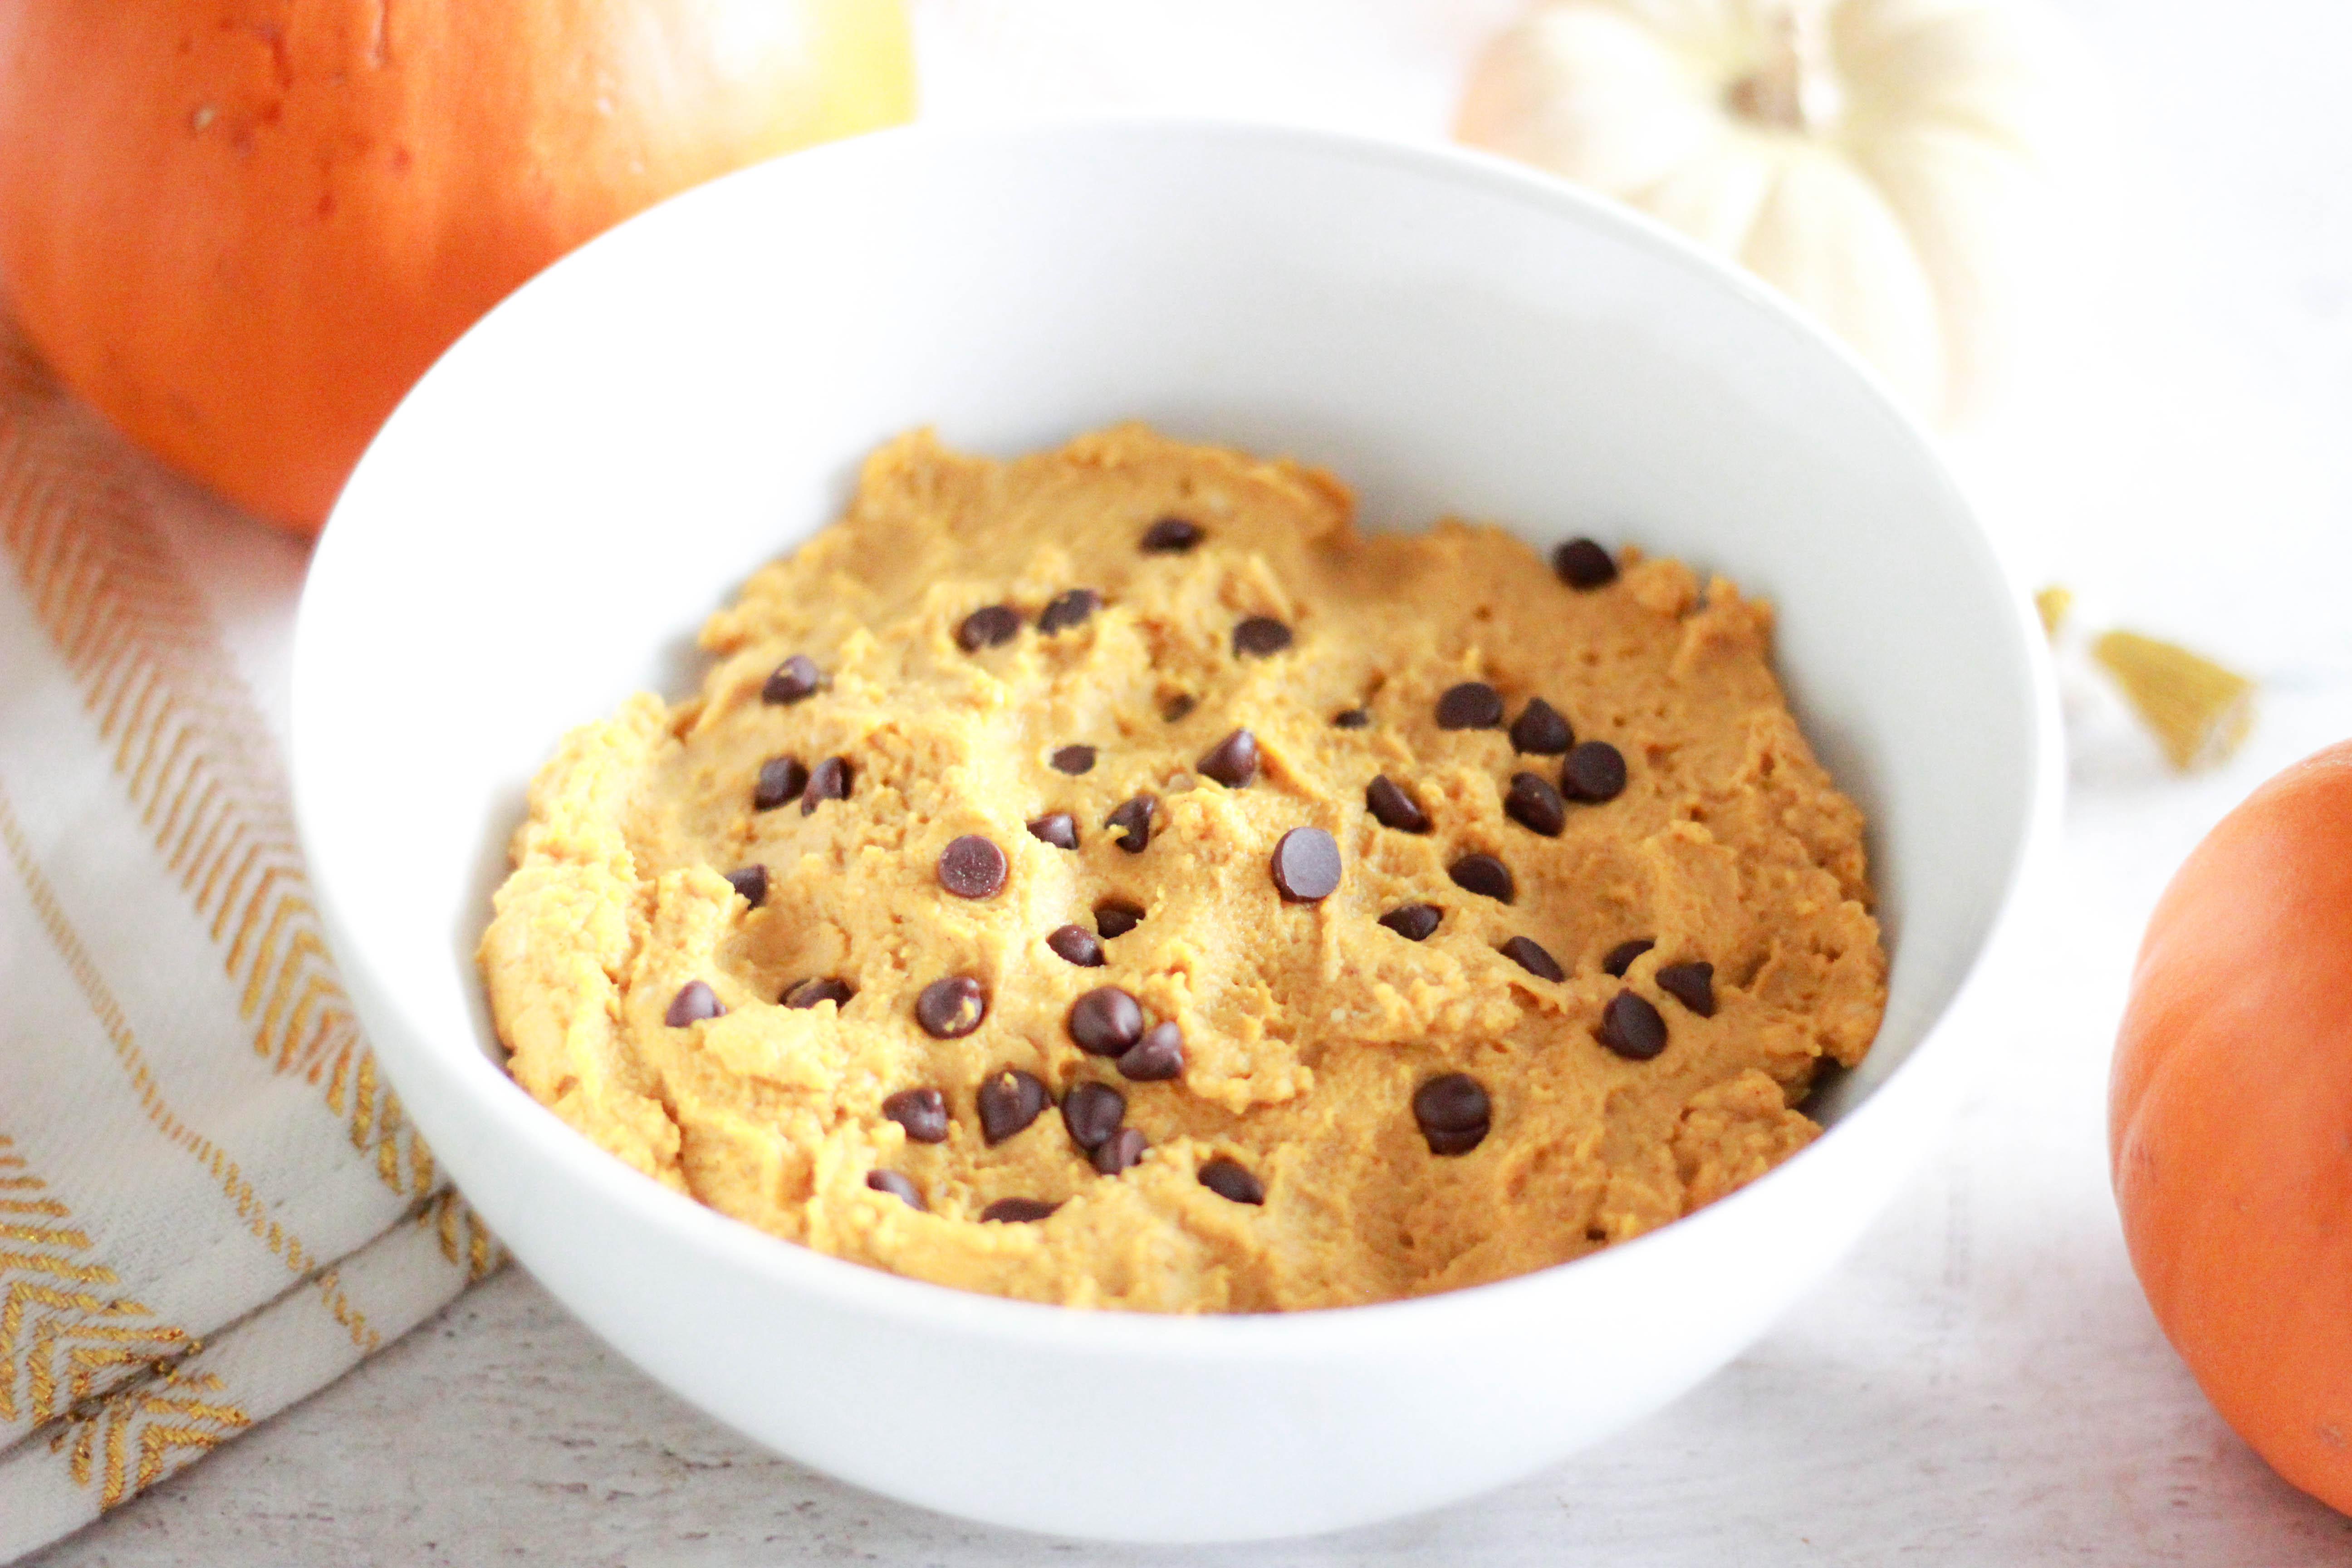 Sugar-Free Edible Pumpkin Protein Cookie Dough (Paleo / Vegan)